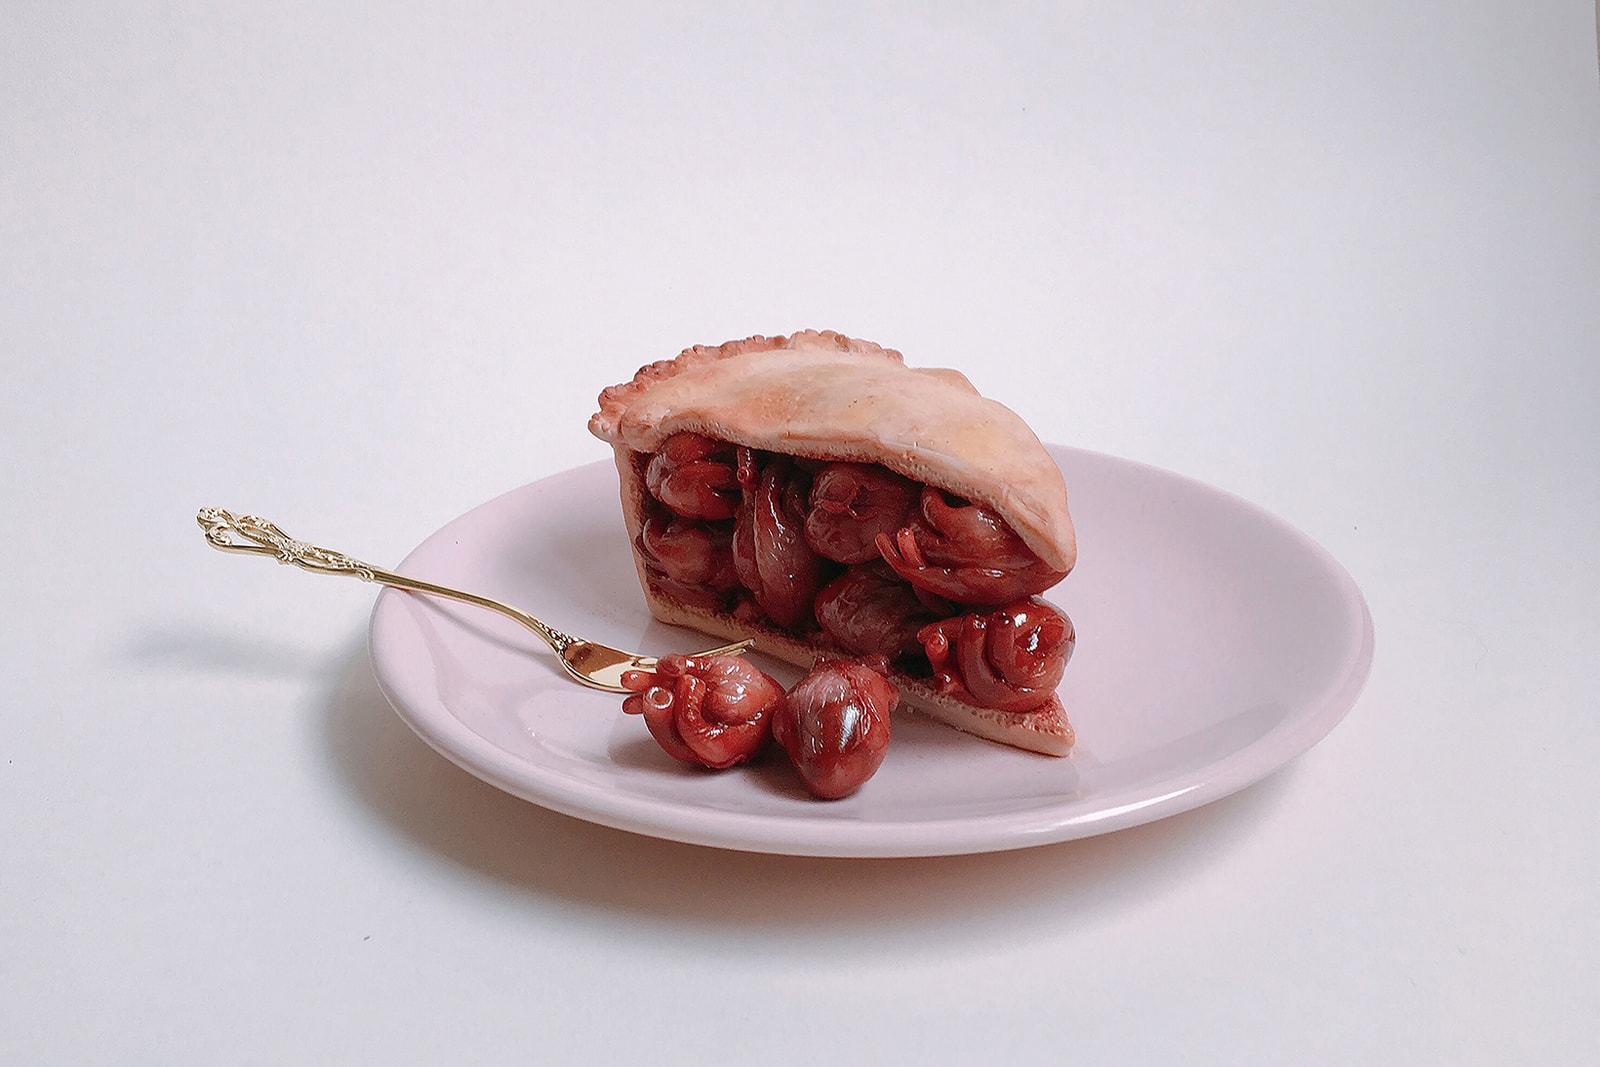 QimmyShimmy Singaporean Artist 3D Clay Sculptures Human Body Food Dimsum Interview